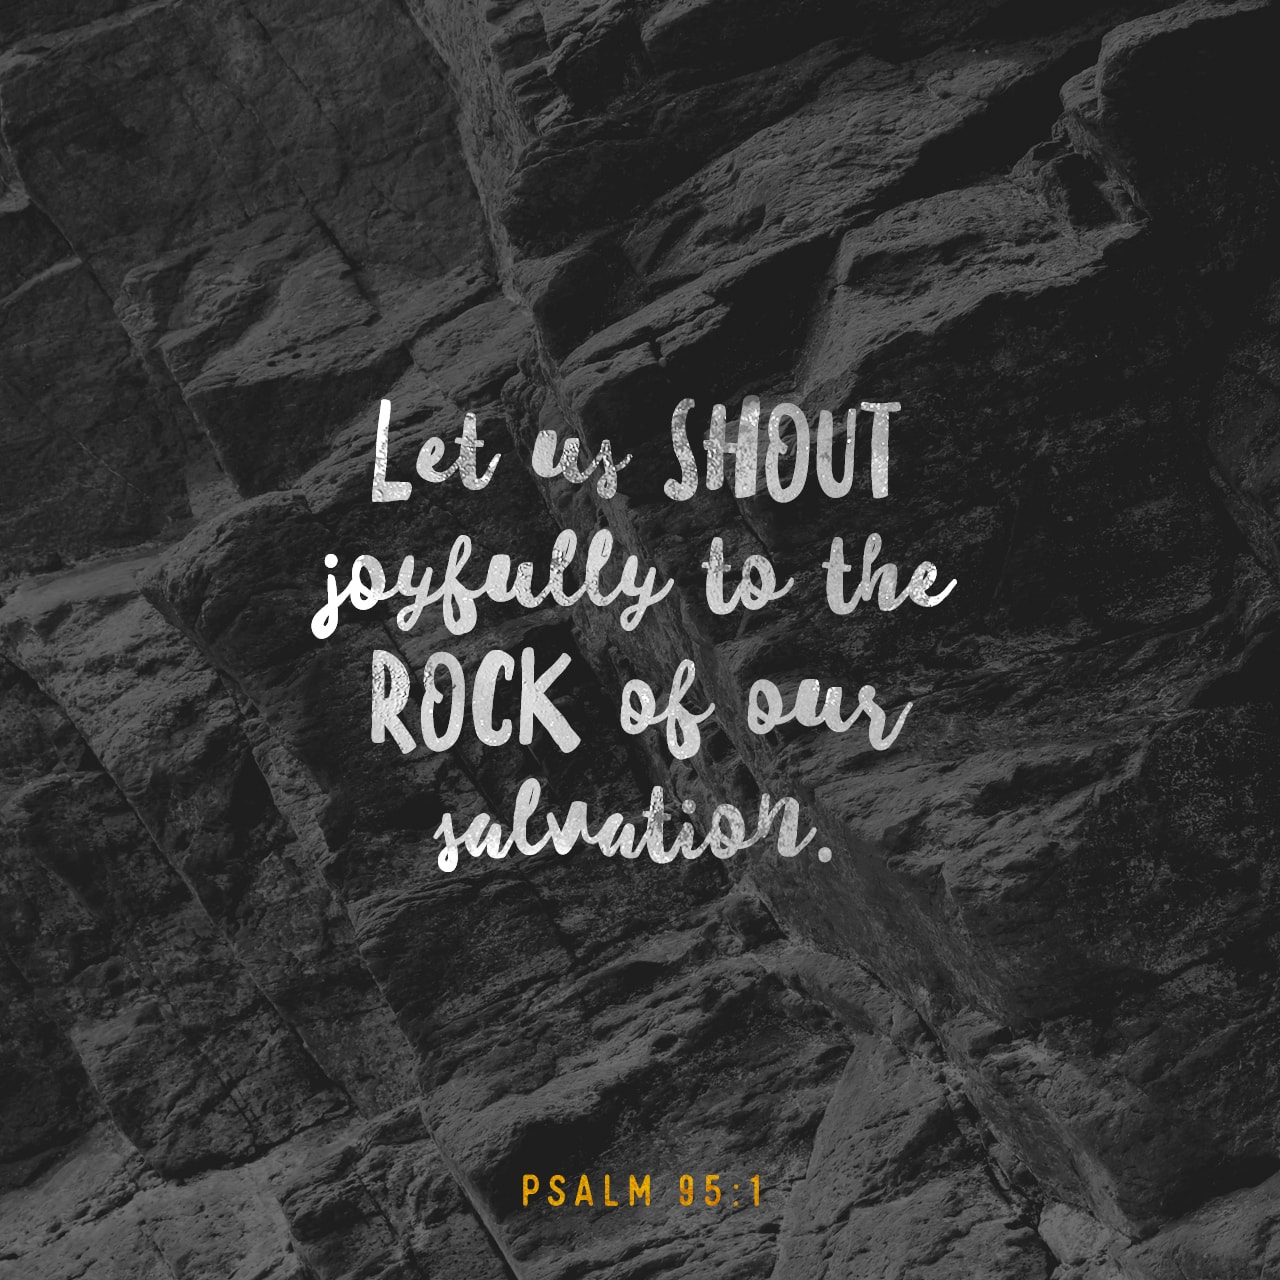 Psalm 95:1 (JPG)